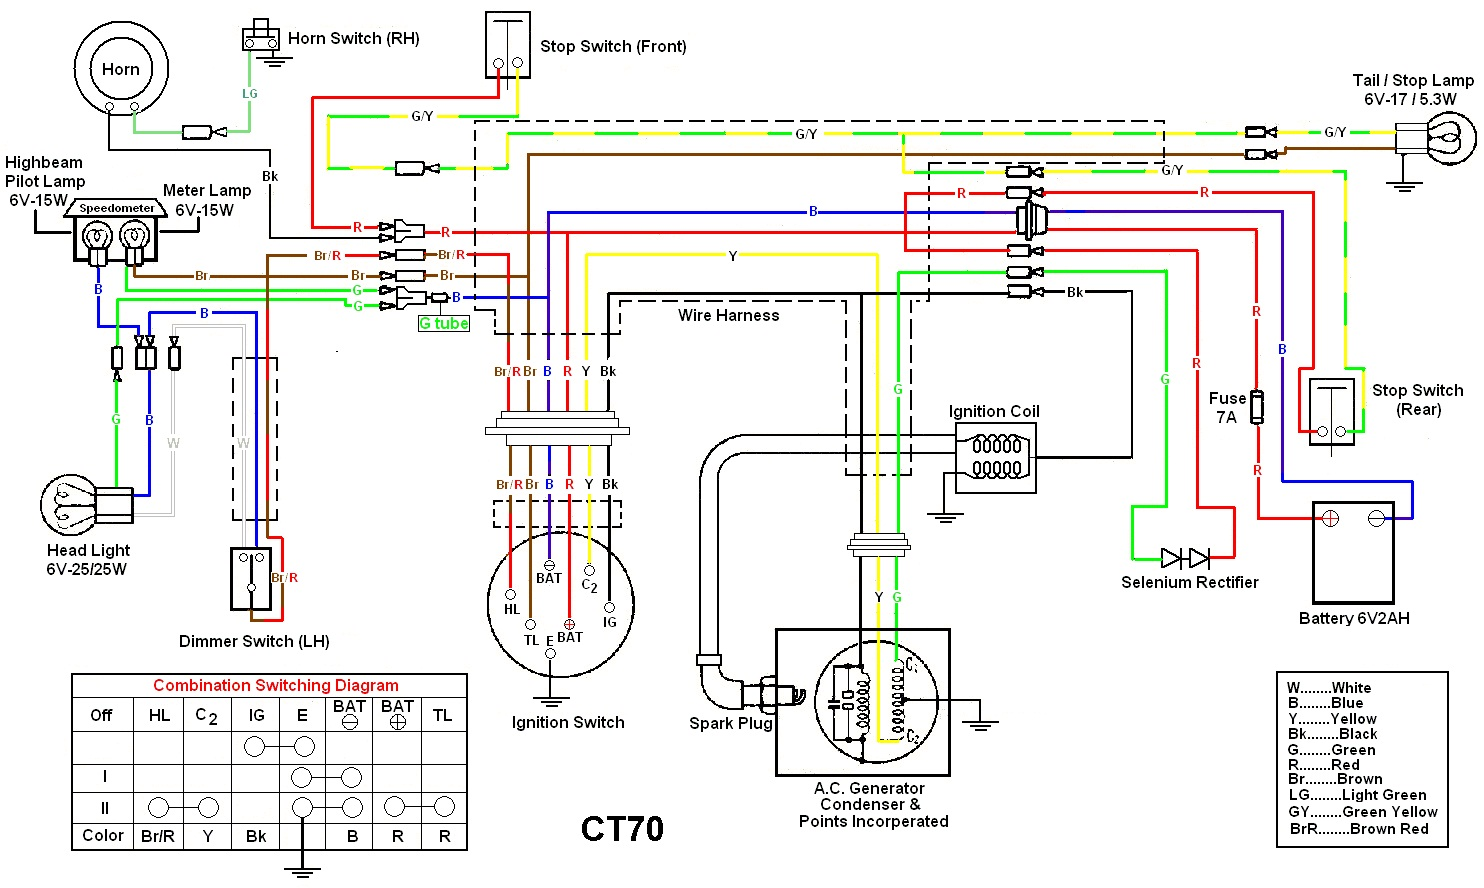 reinke wiring diagram wiring free printable wiring diagrams